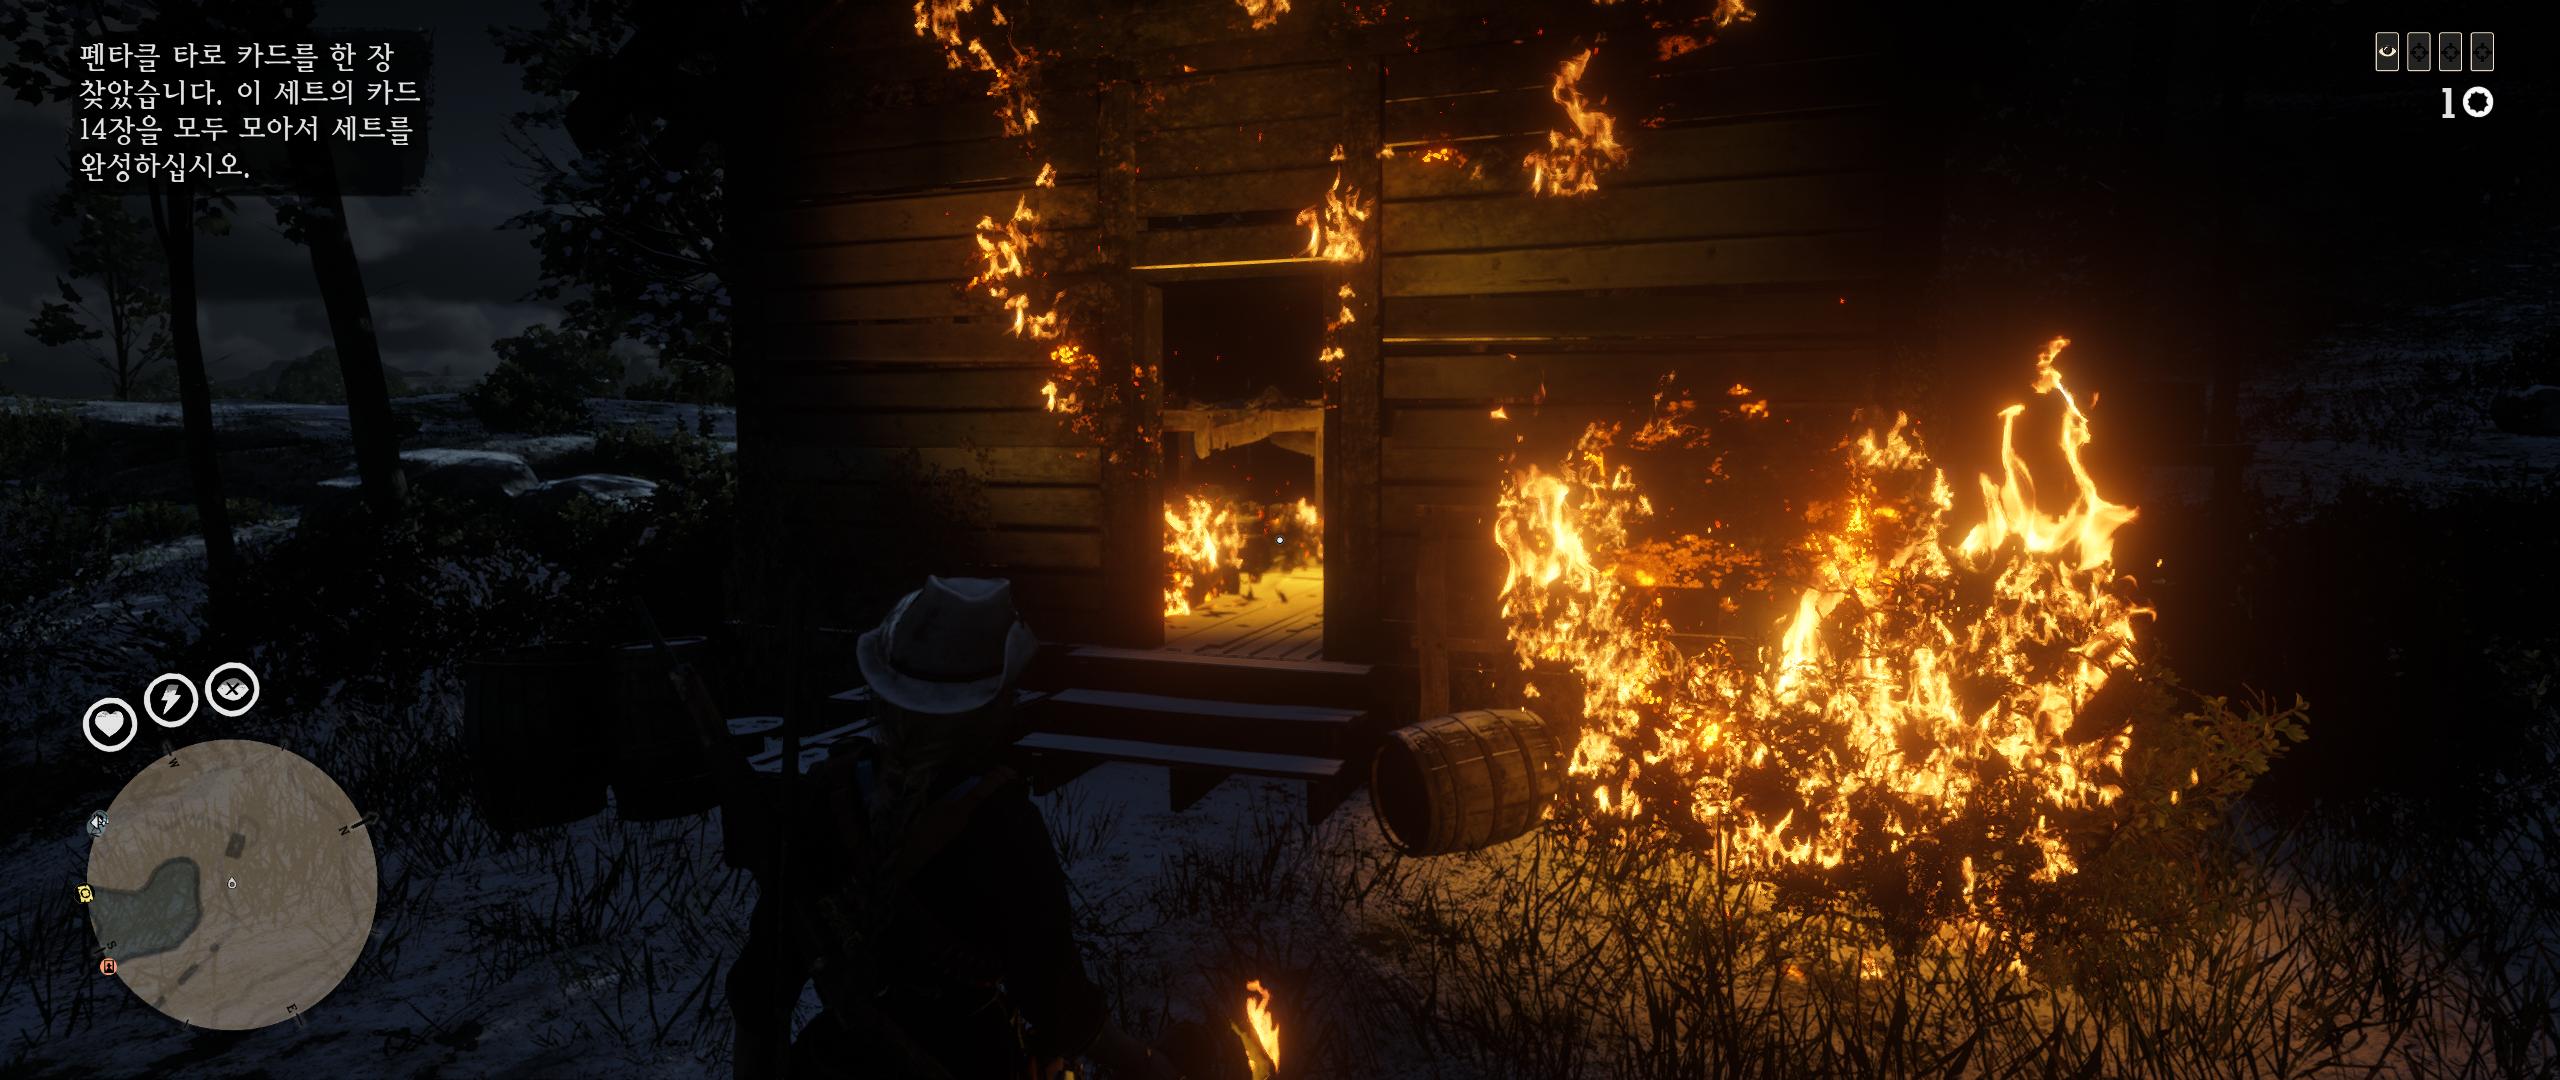 Red Dead Redemption 2 Screenshot 2019.12.22 - 15.28.55.06